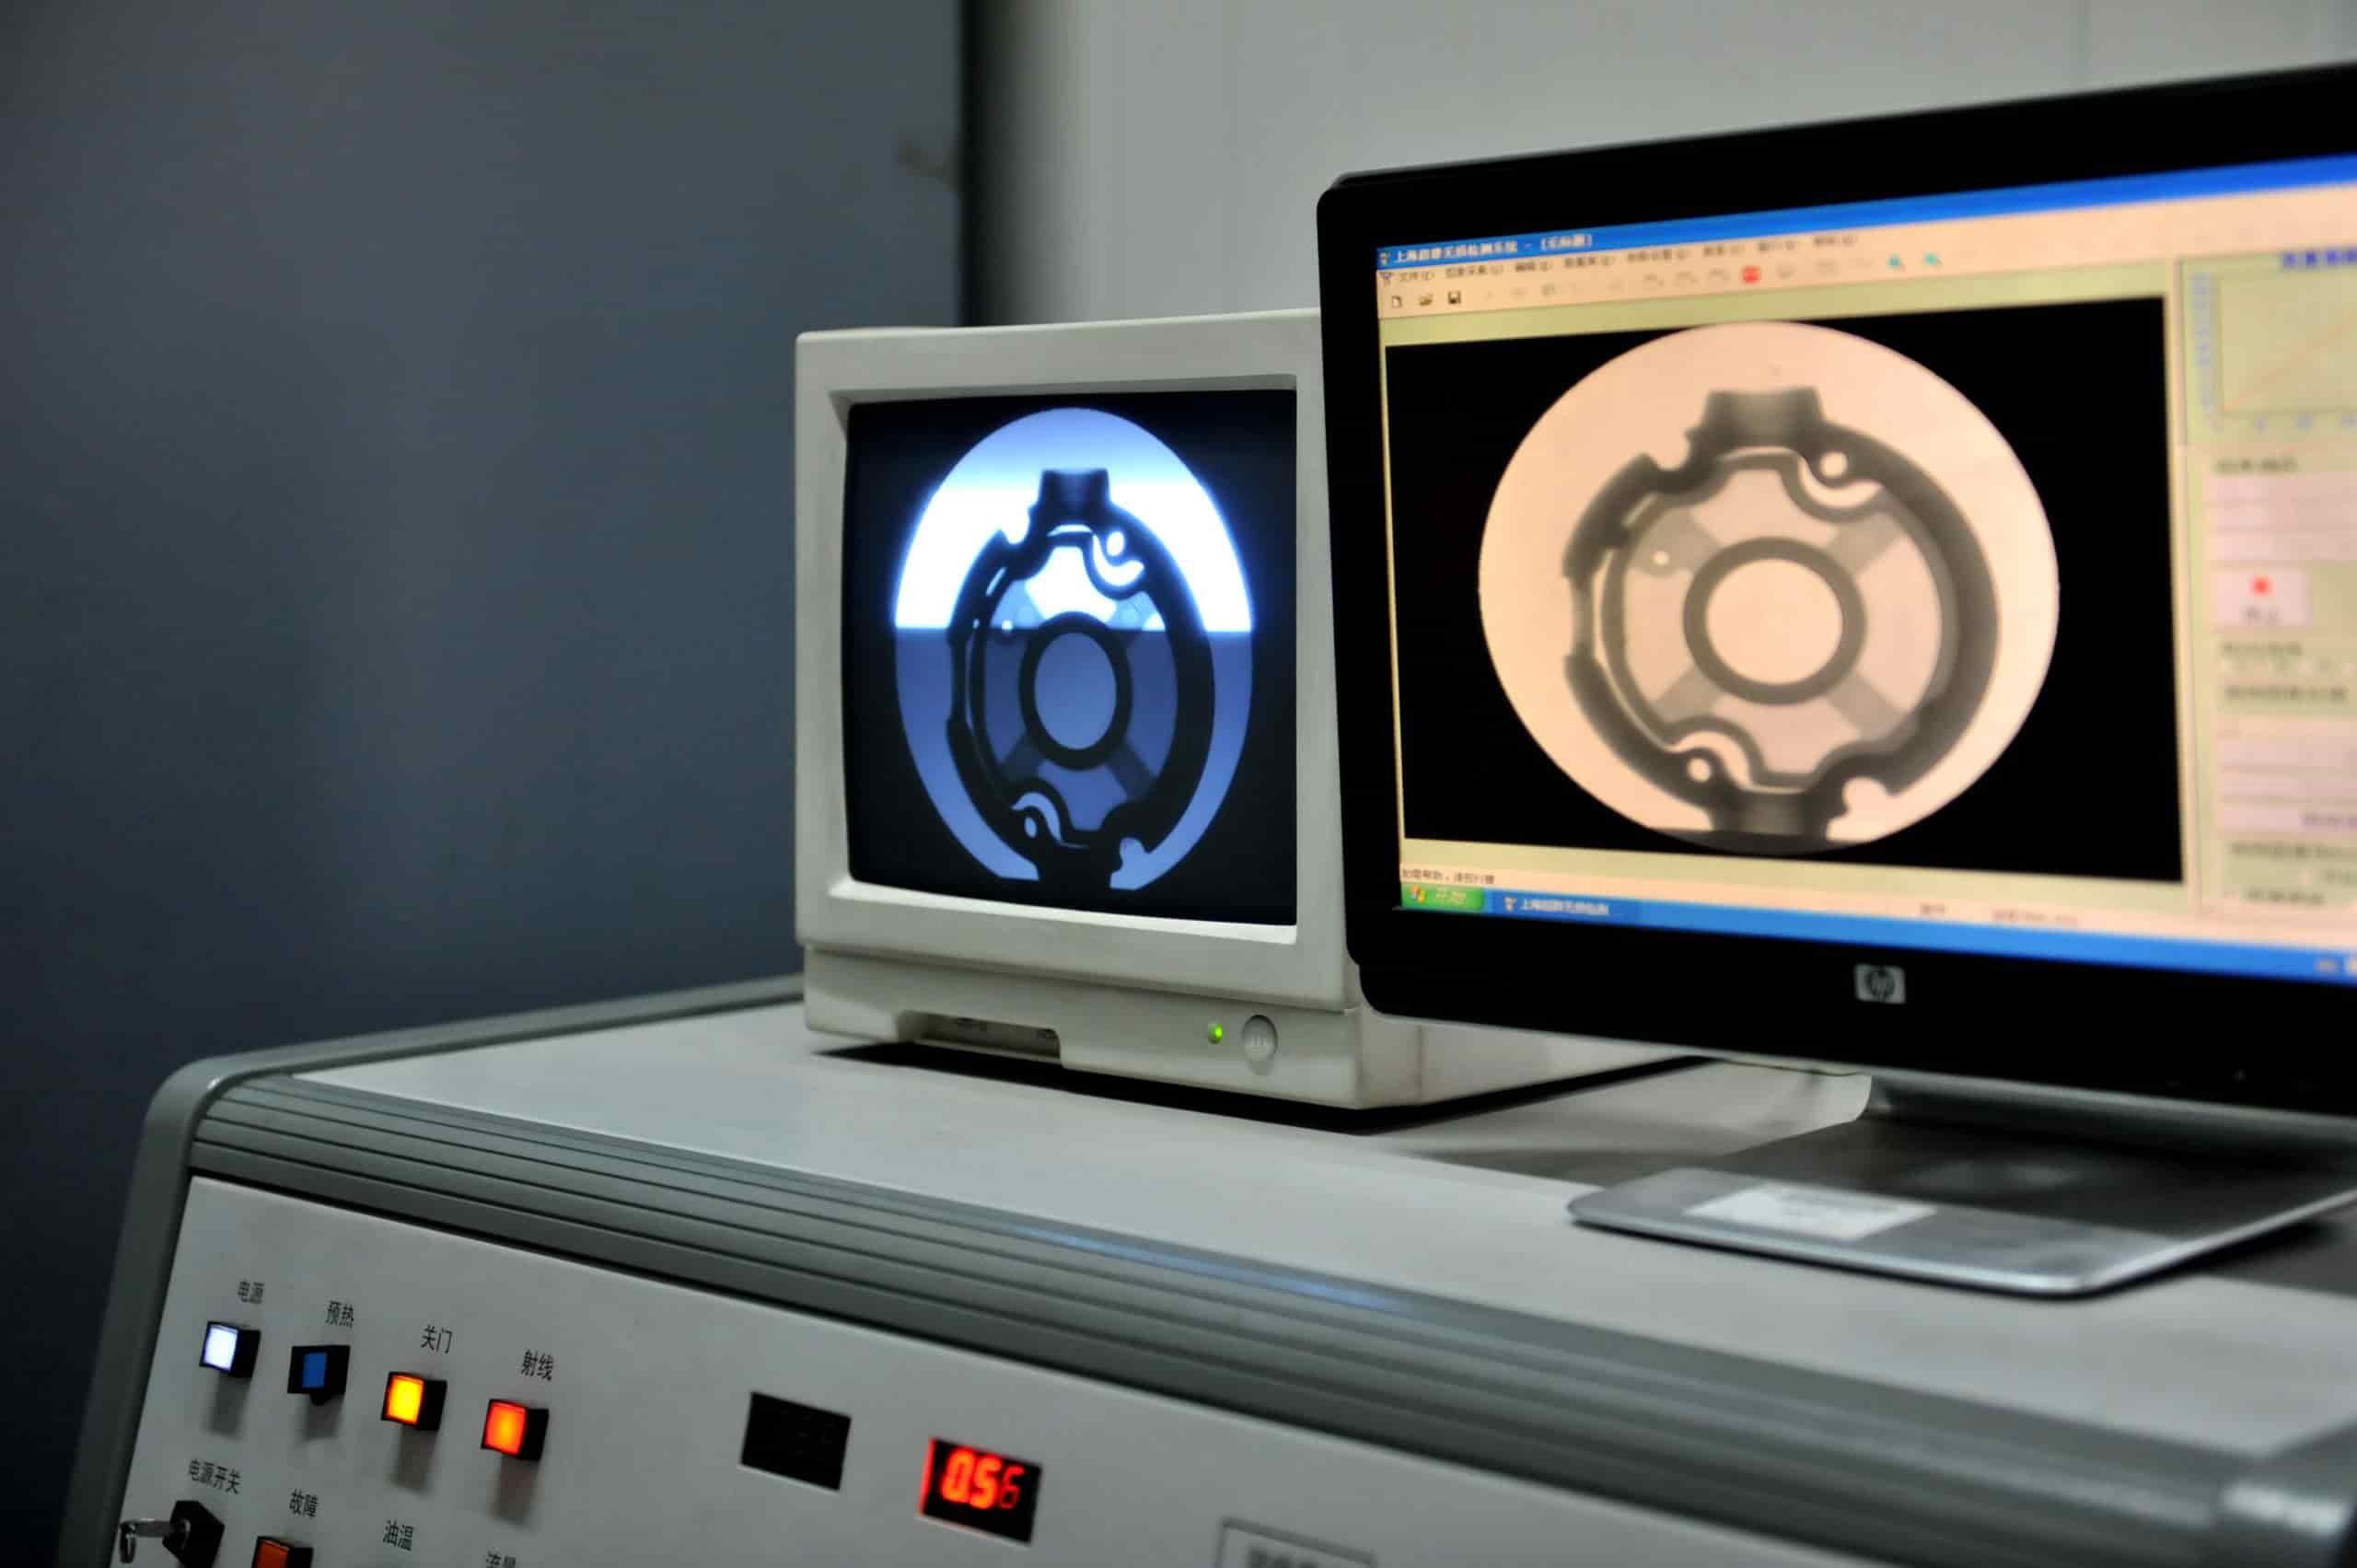 X-Ray Detector